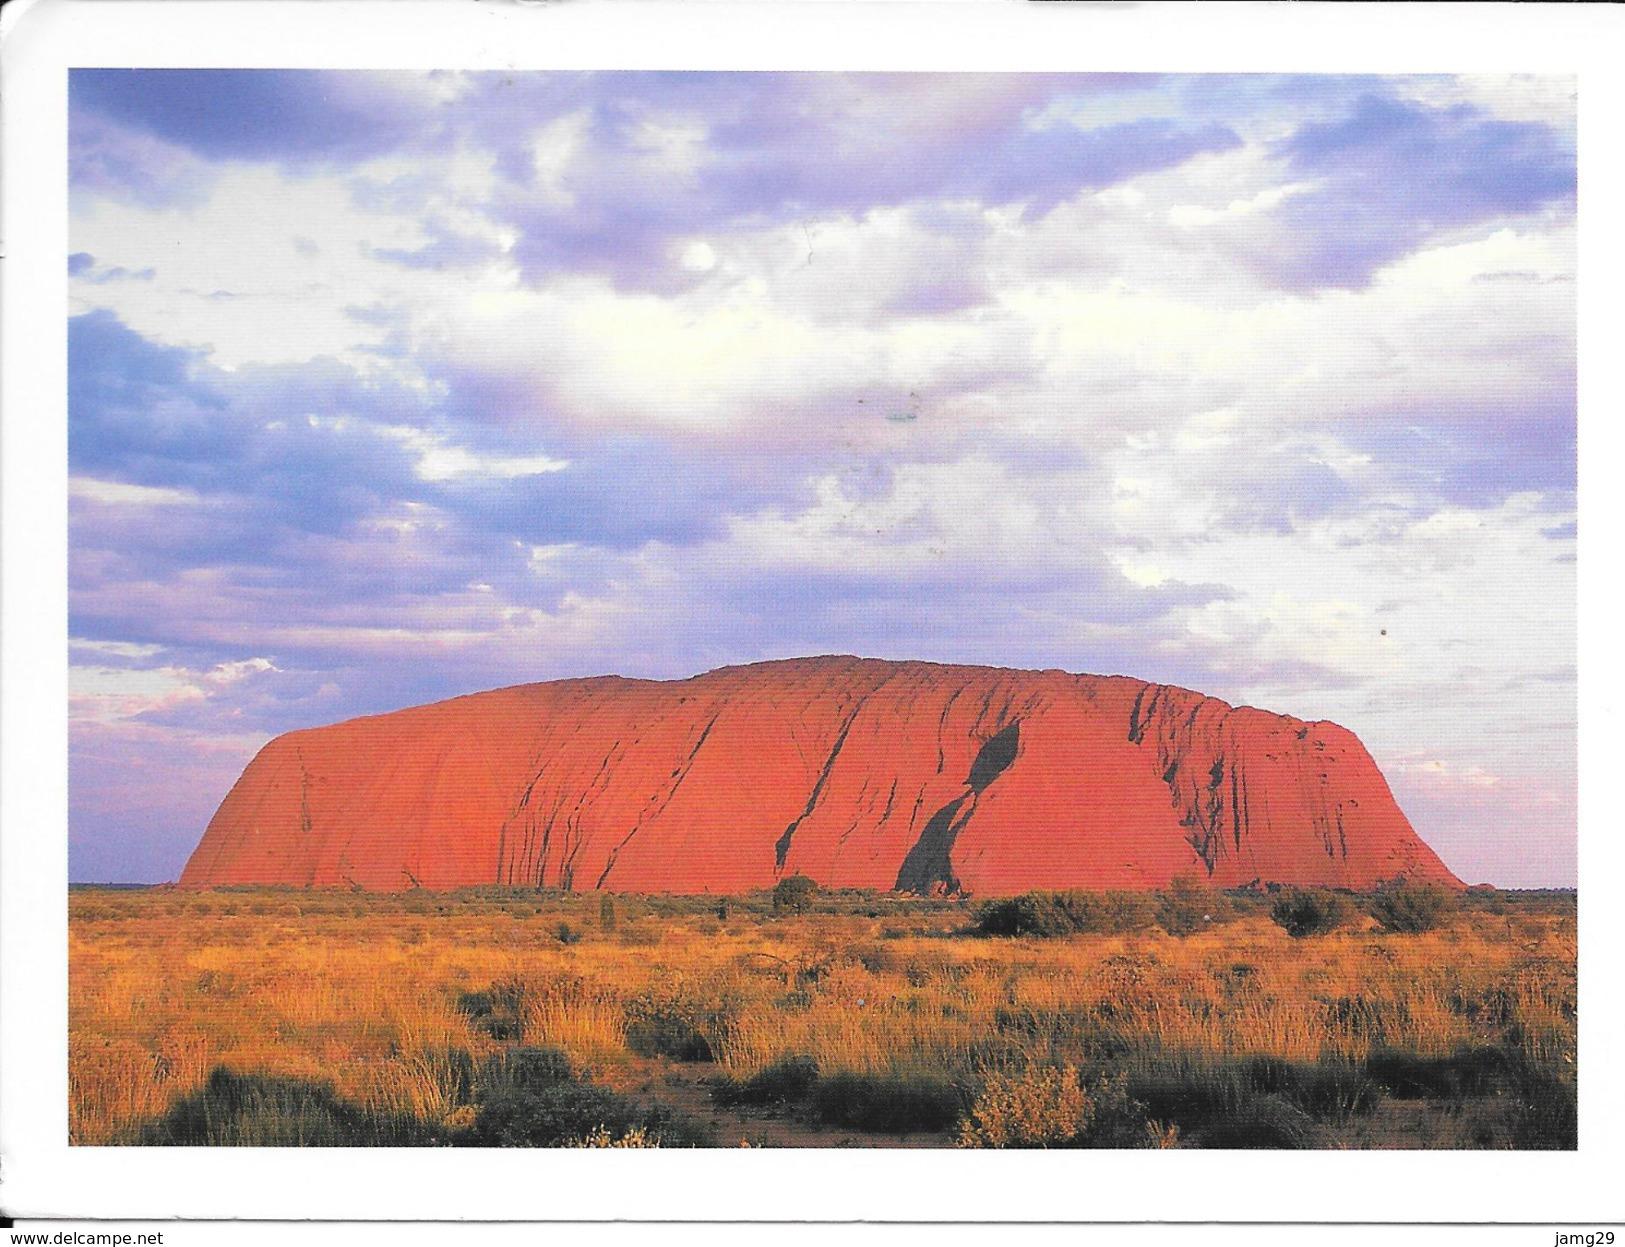 Australië/Australia, Uluru, Ayers Rock, 2016 - Uluru & The Olgas